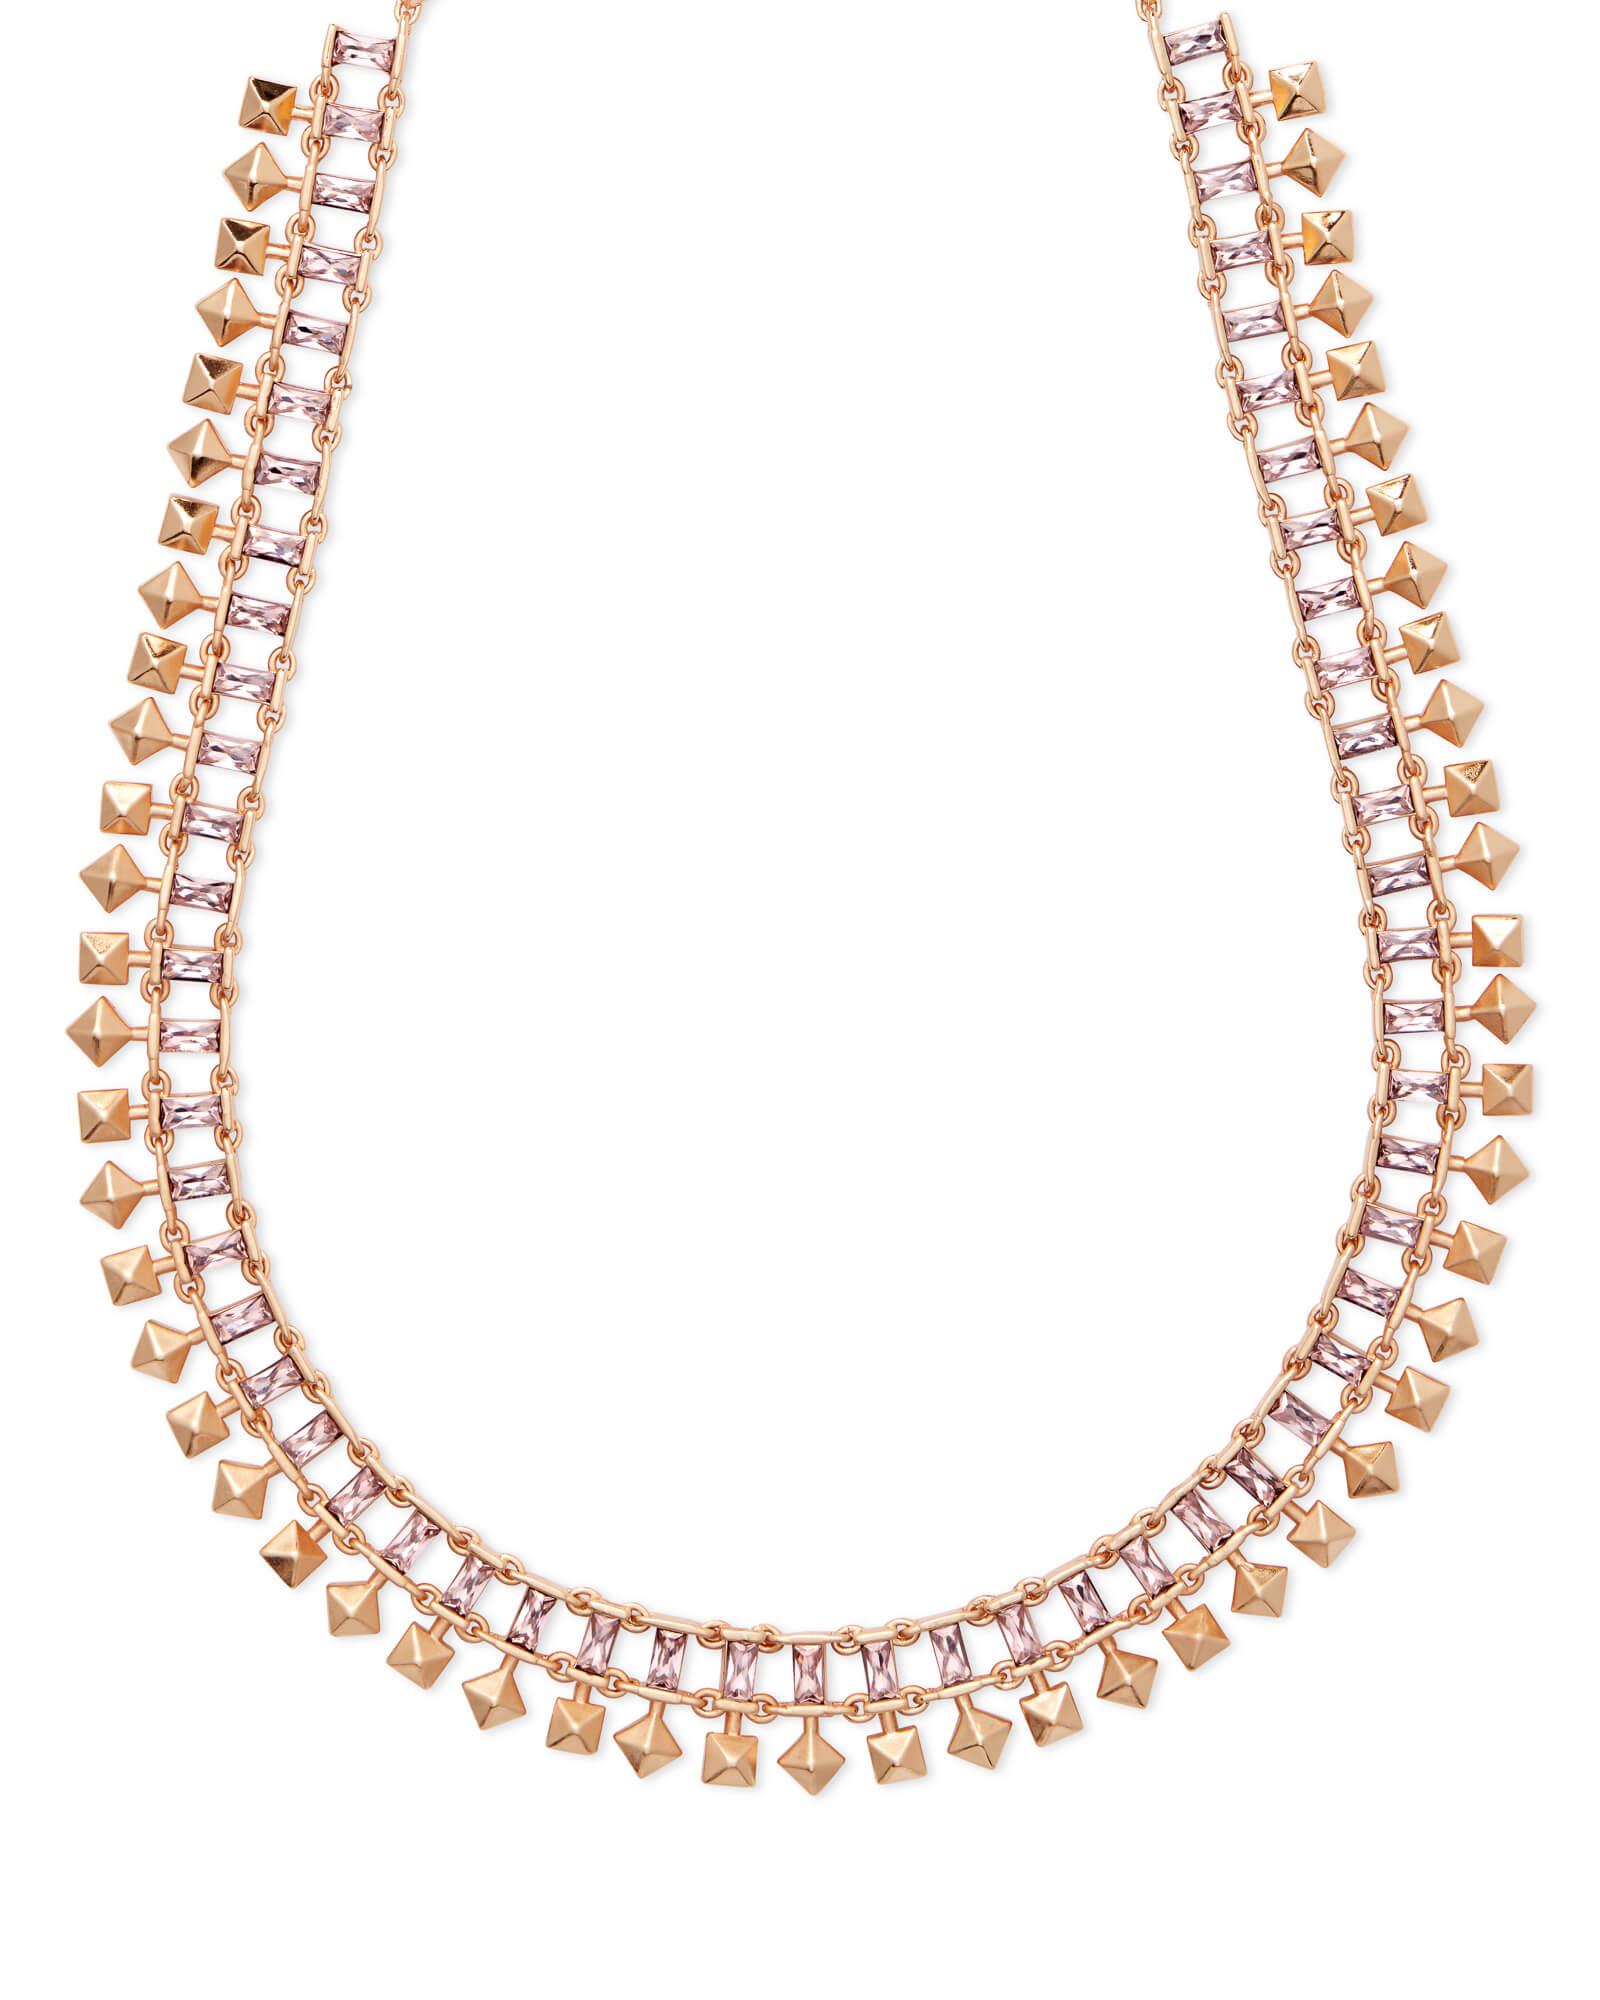 Oscar Rose Gold Choker Necklace in Blush Crystal | Kendra Scott